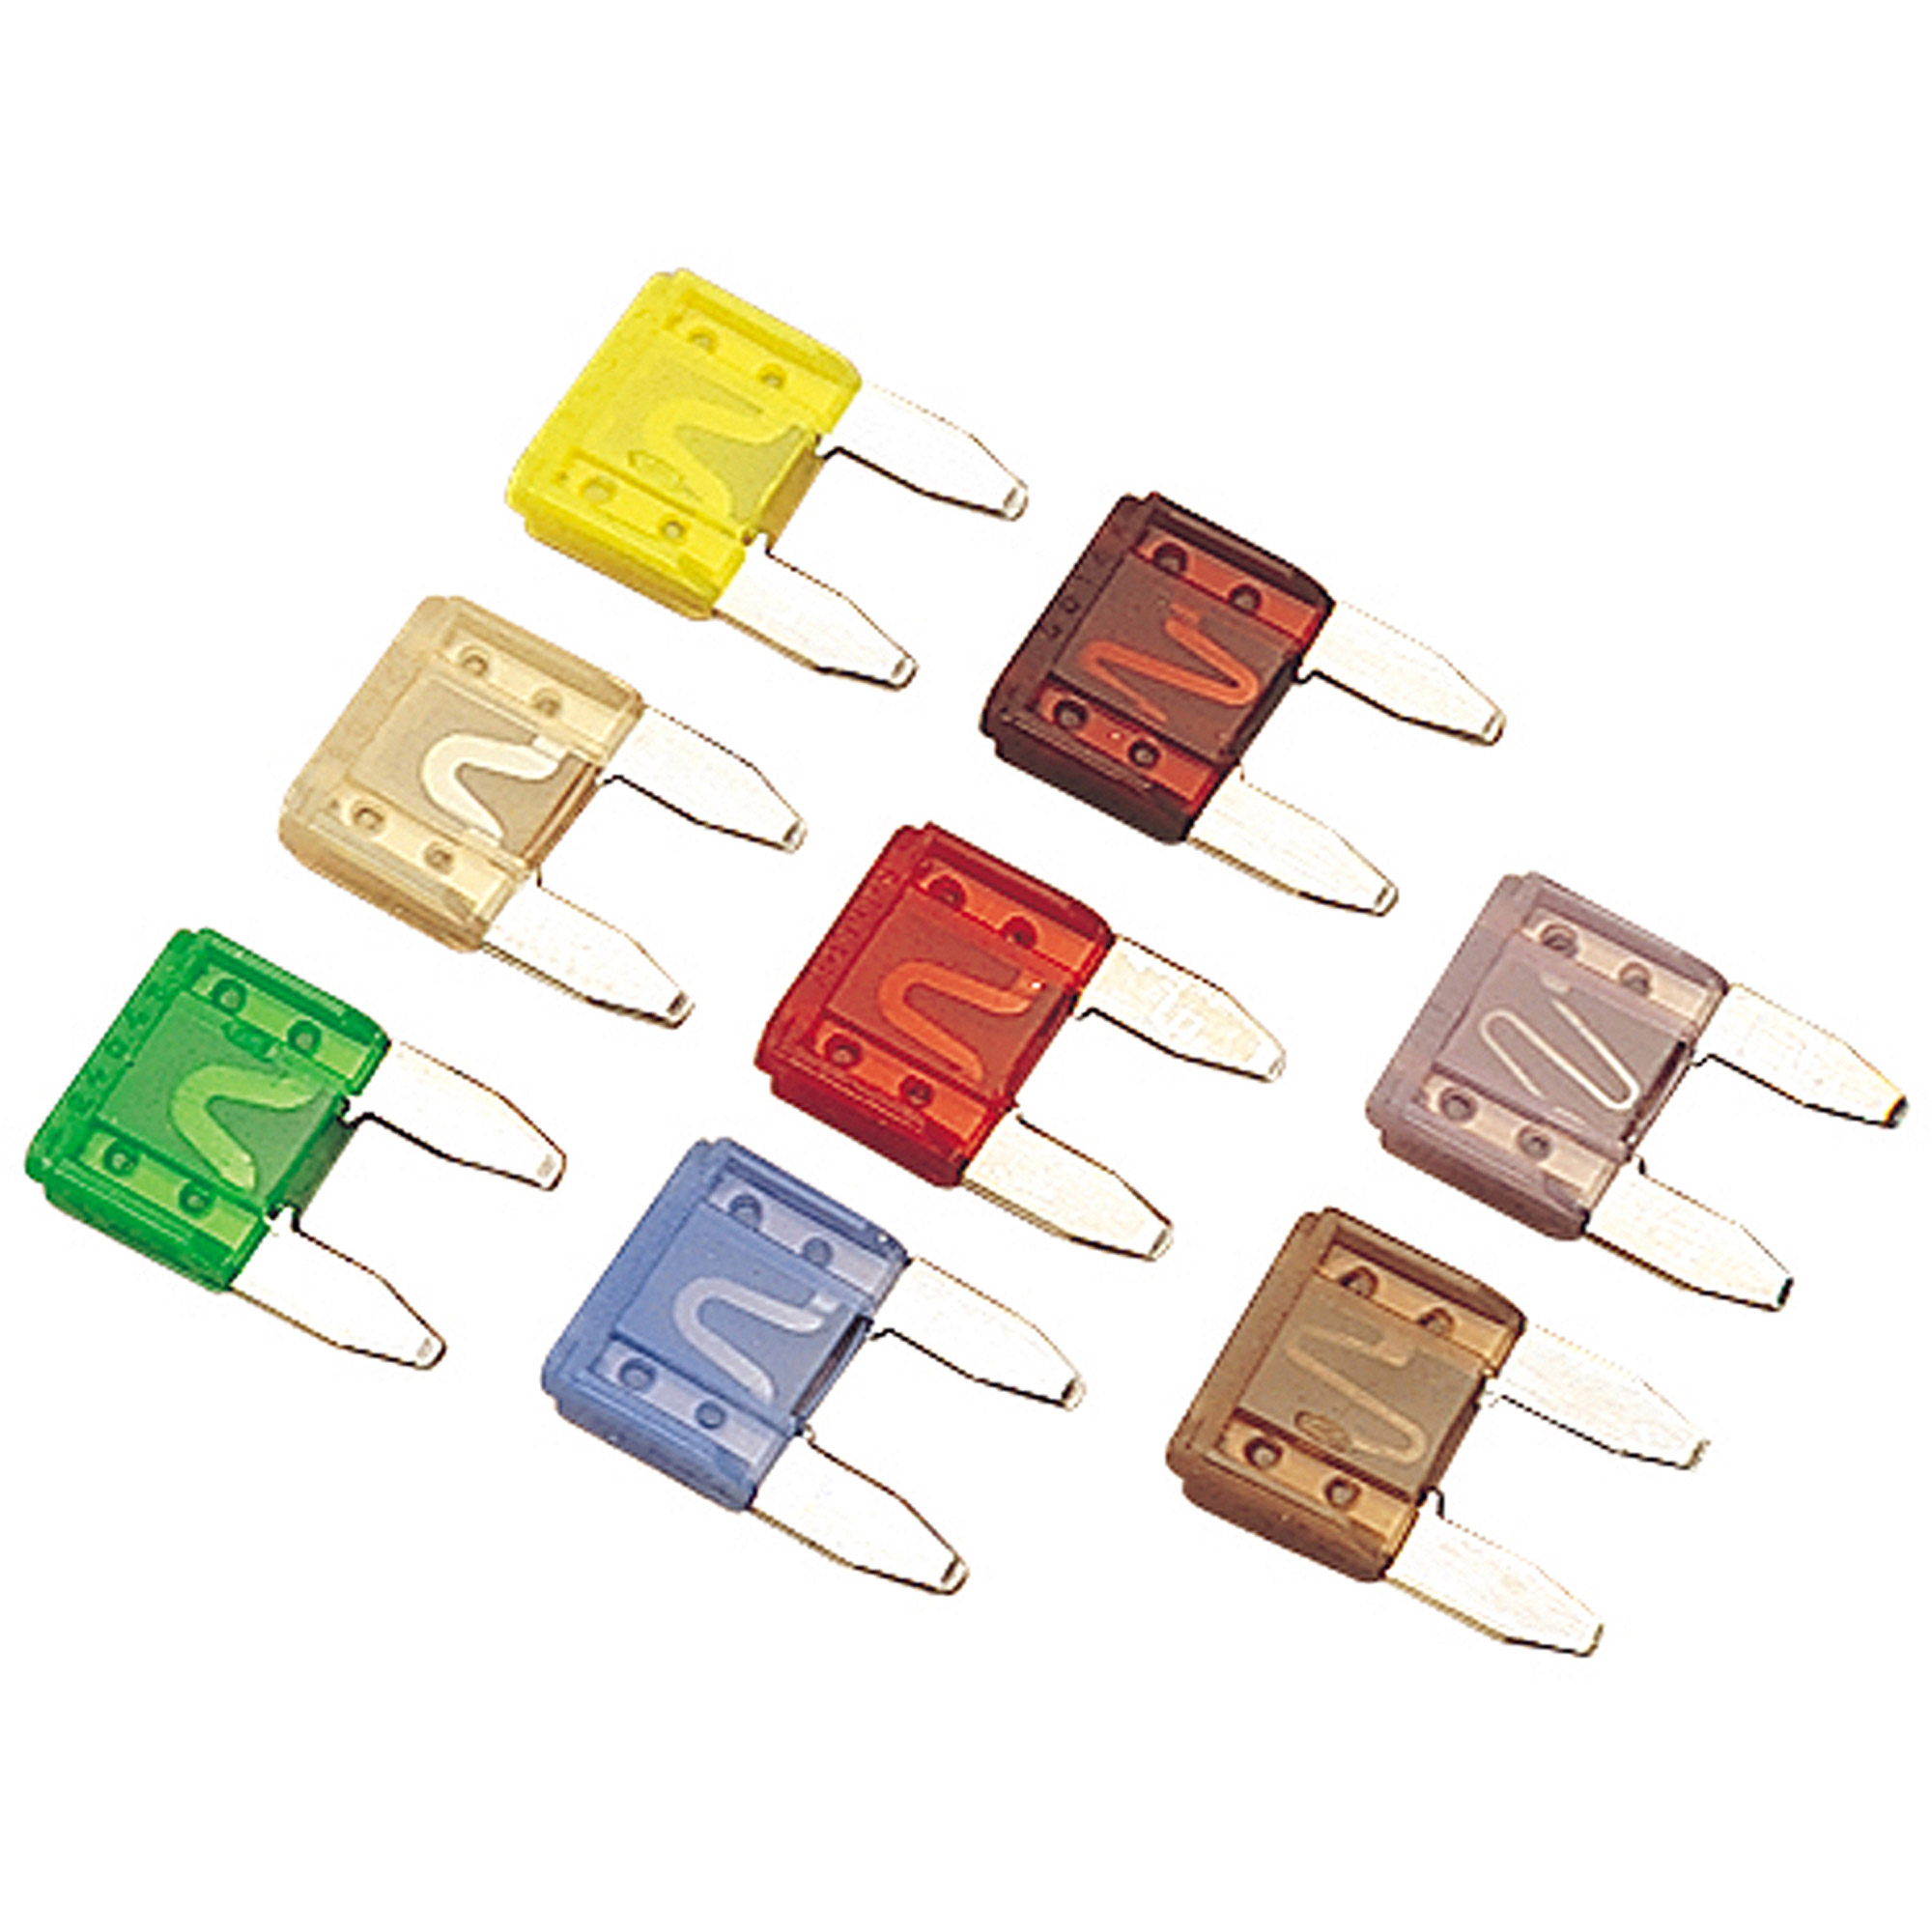 Sea Dog ATM Mini Style Fuse, 10 Amp, Pack of 5